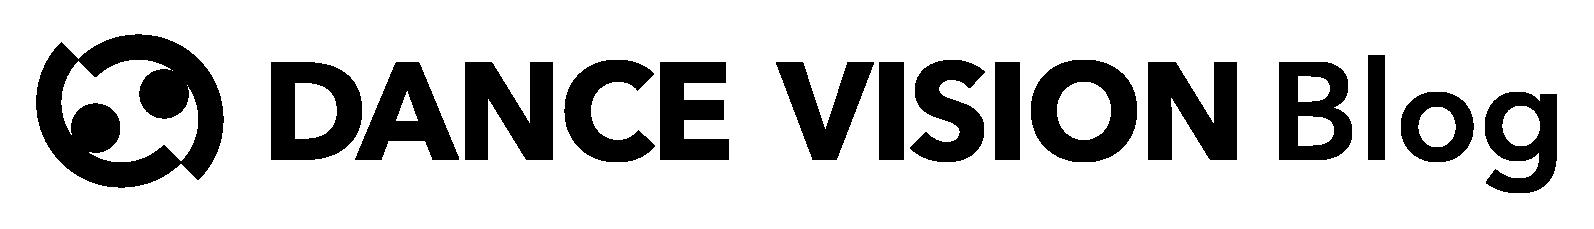 Dance Vision Blog Logo